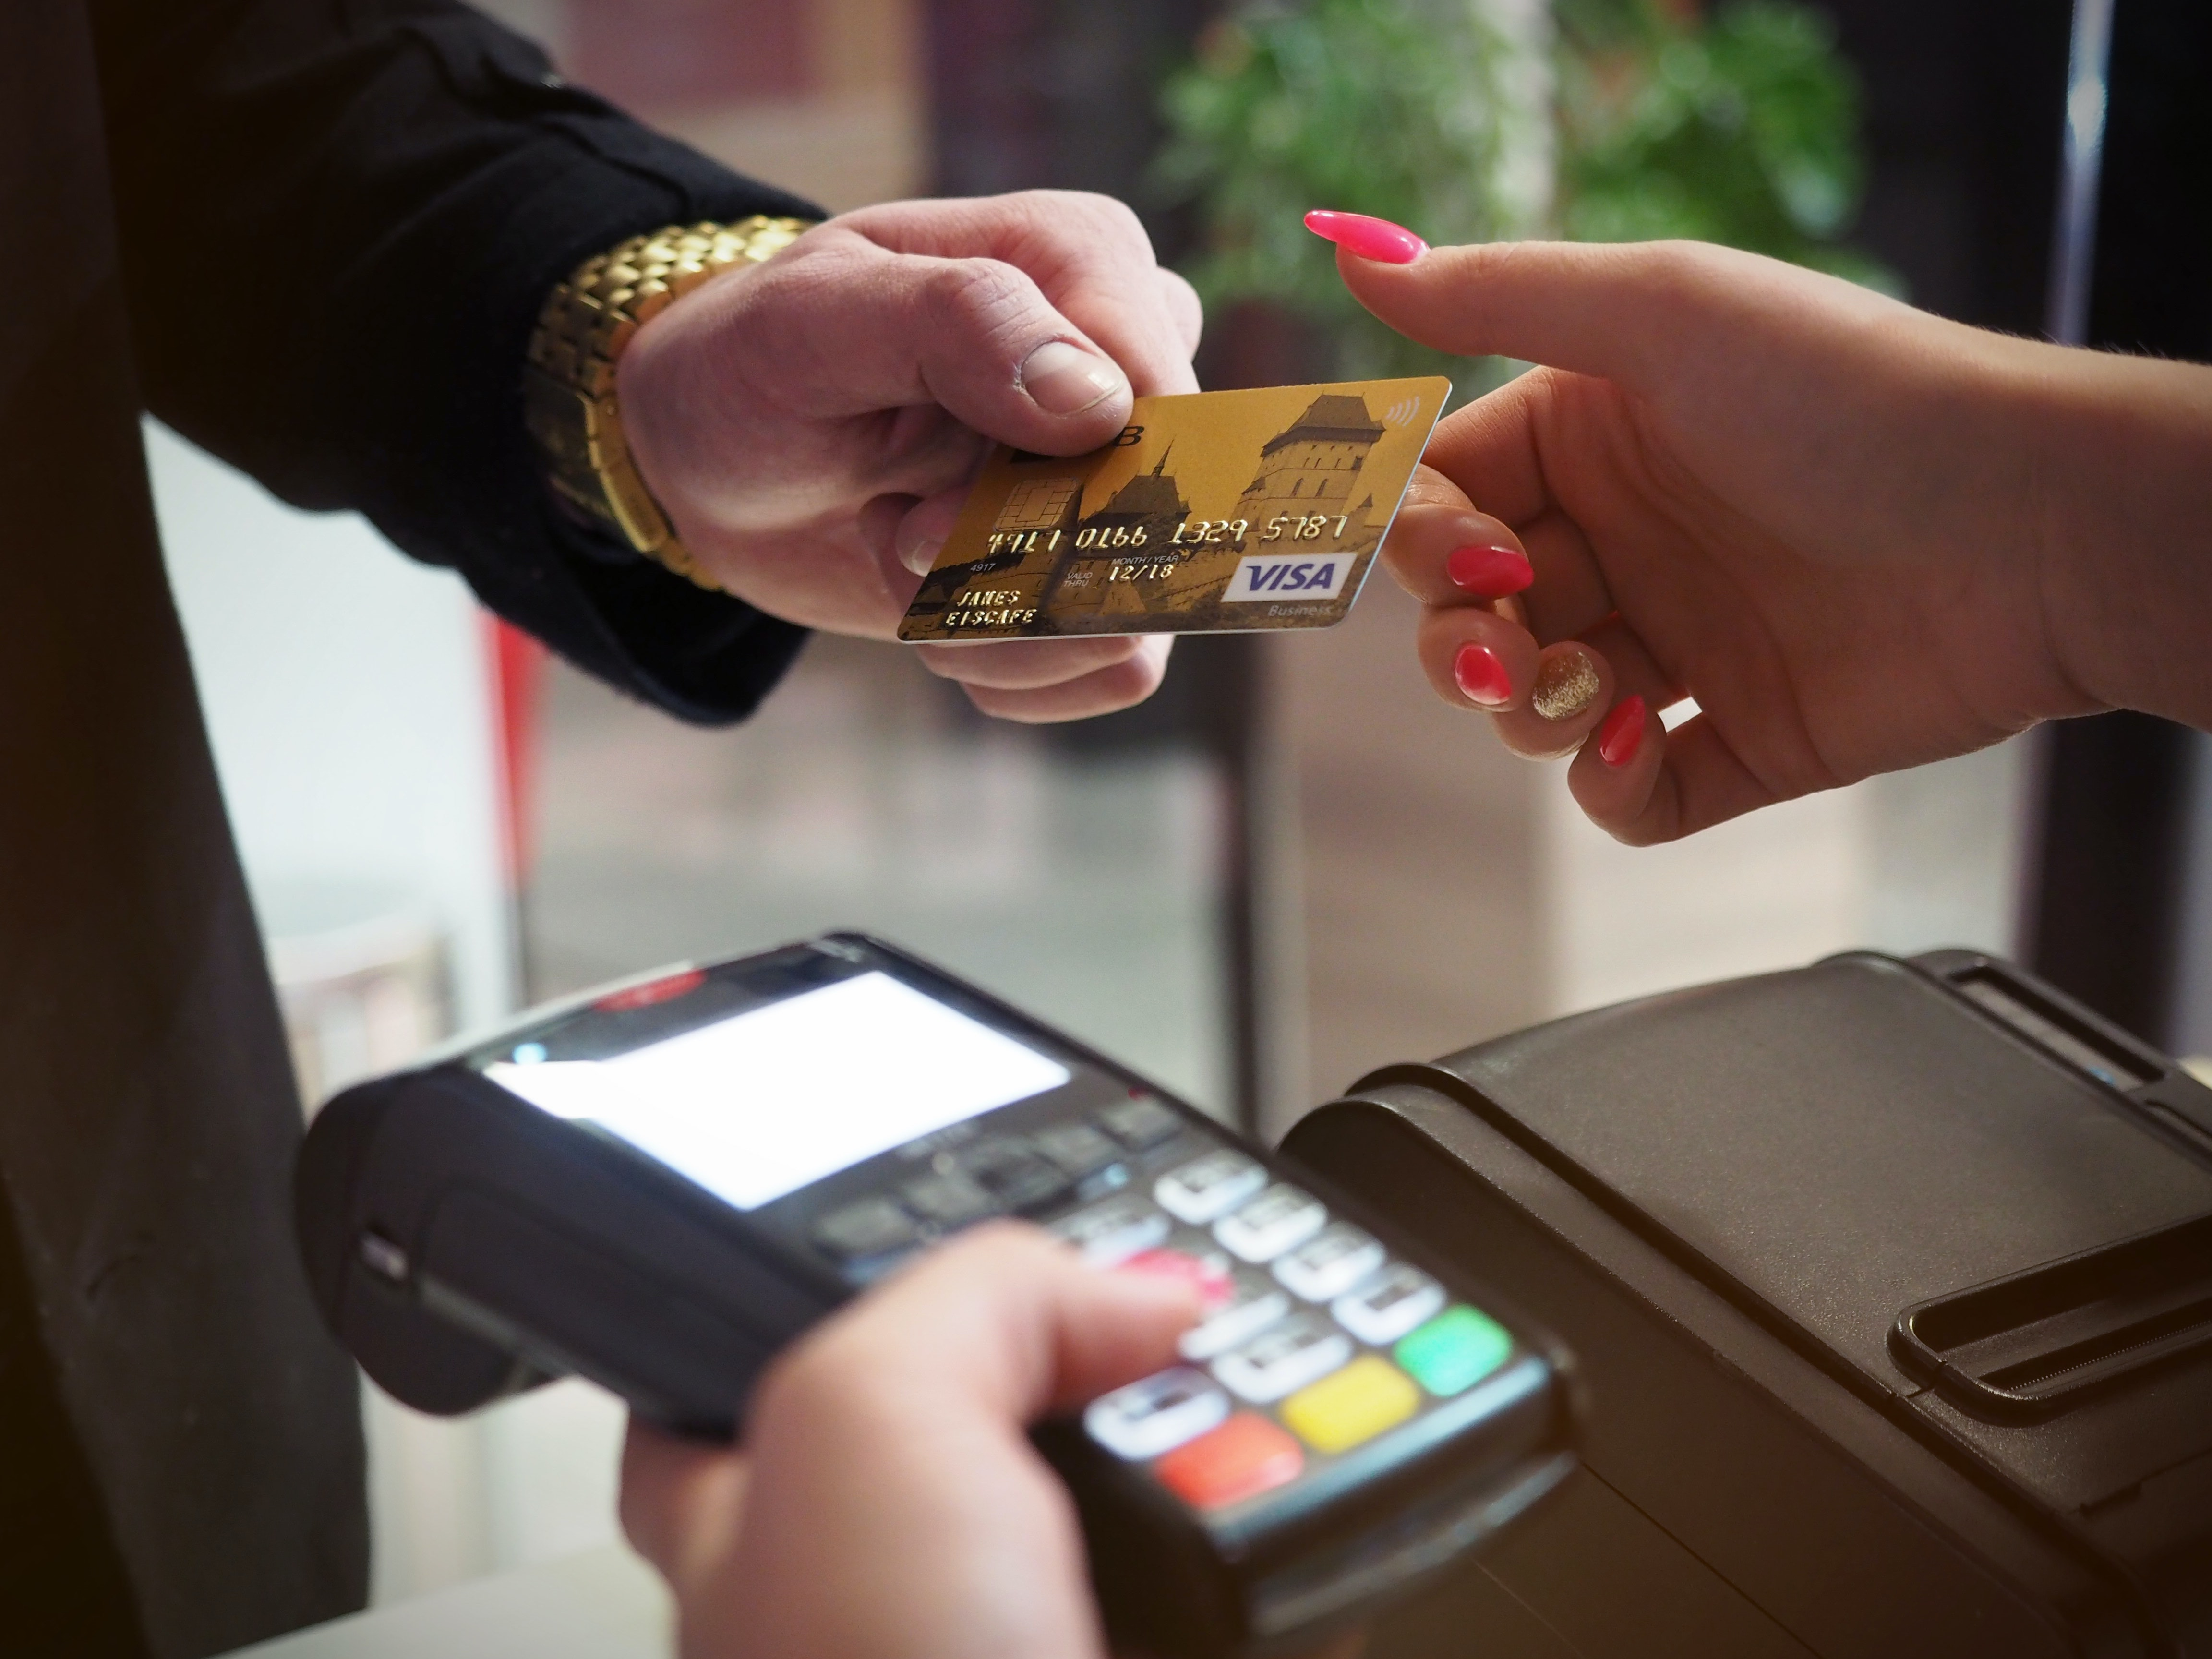 Helping financial enterprises go digital through customer acquisition and retention